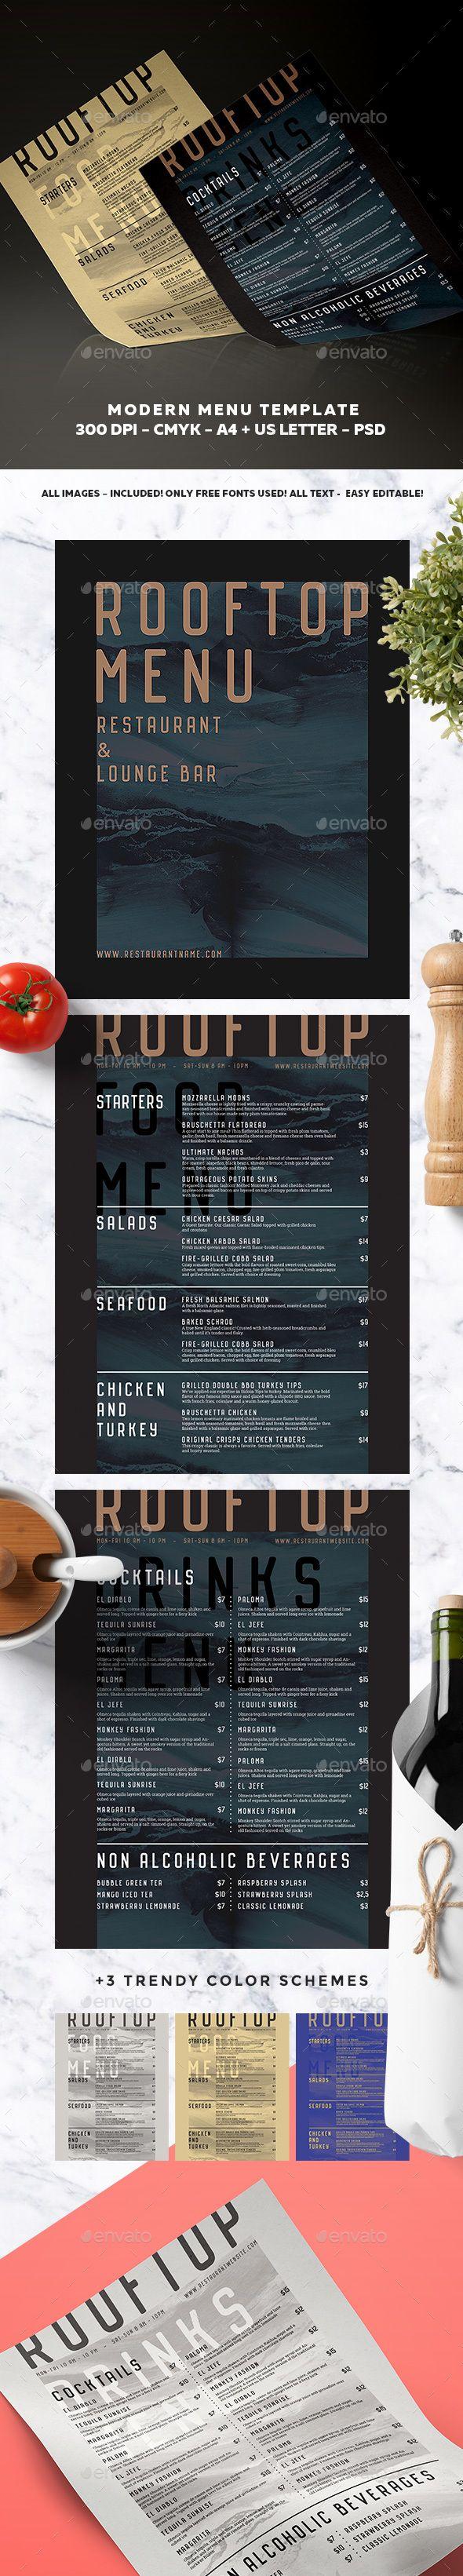 Best 25 menu templates ideas on pinterest food menu template menu template pronofoot35fo Image collections